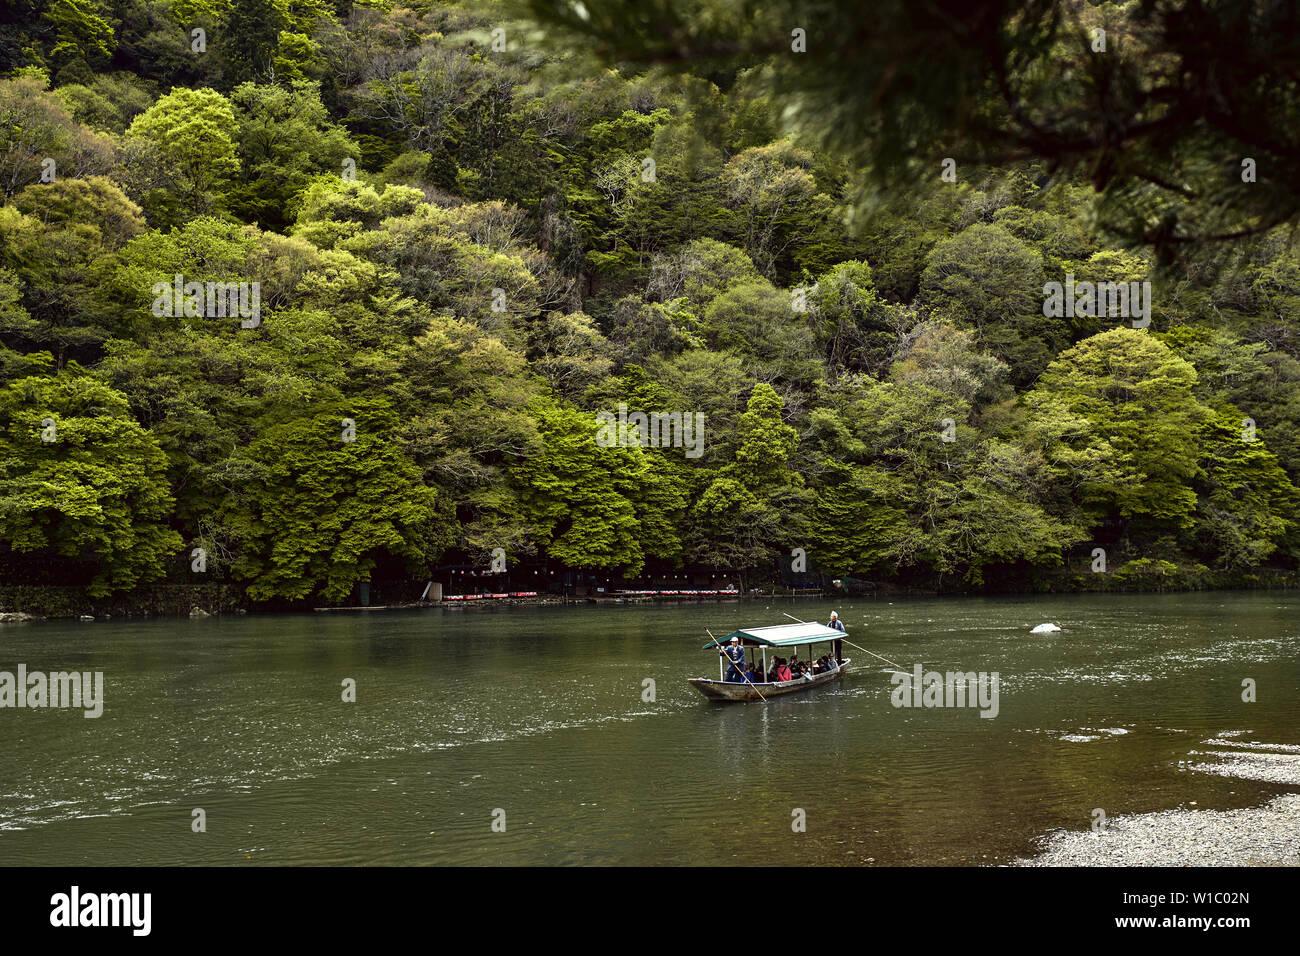 Tourists cruising down the Hozu River in Arashiyama, Japan - Stock Image